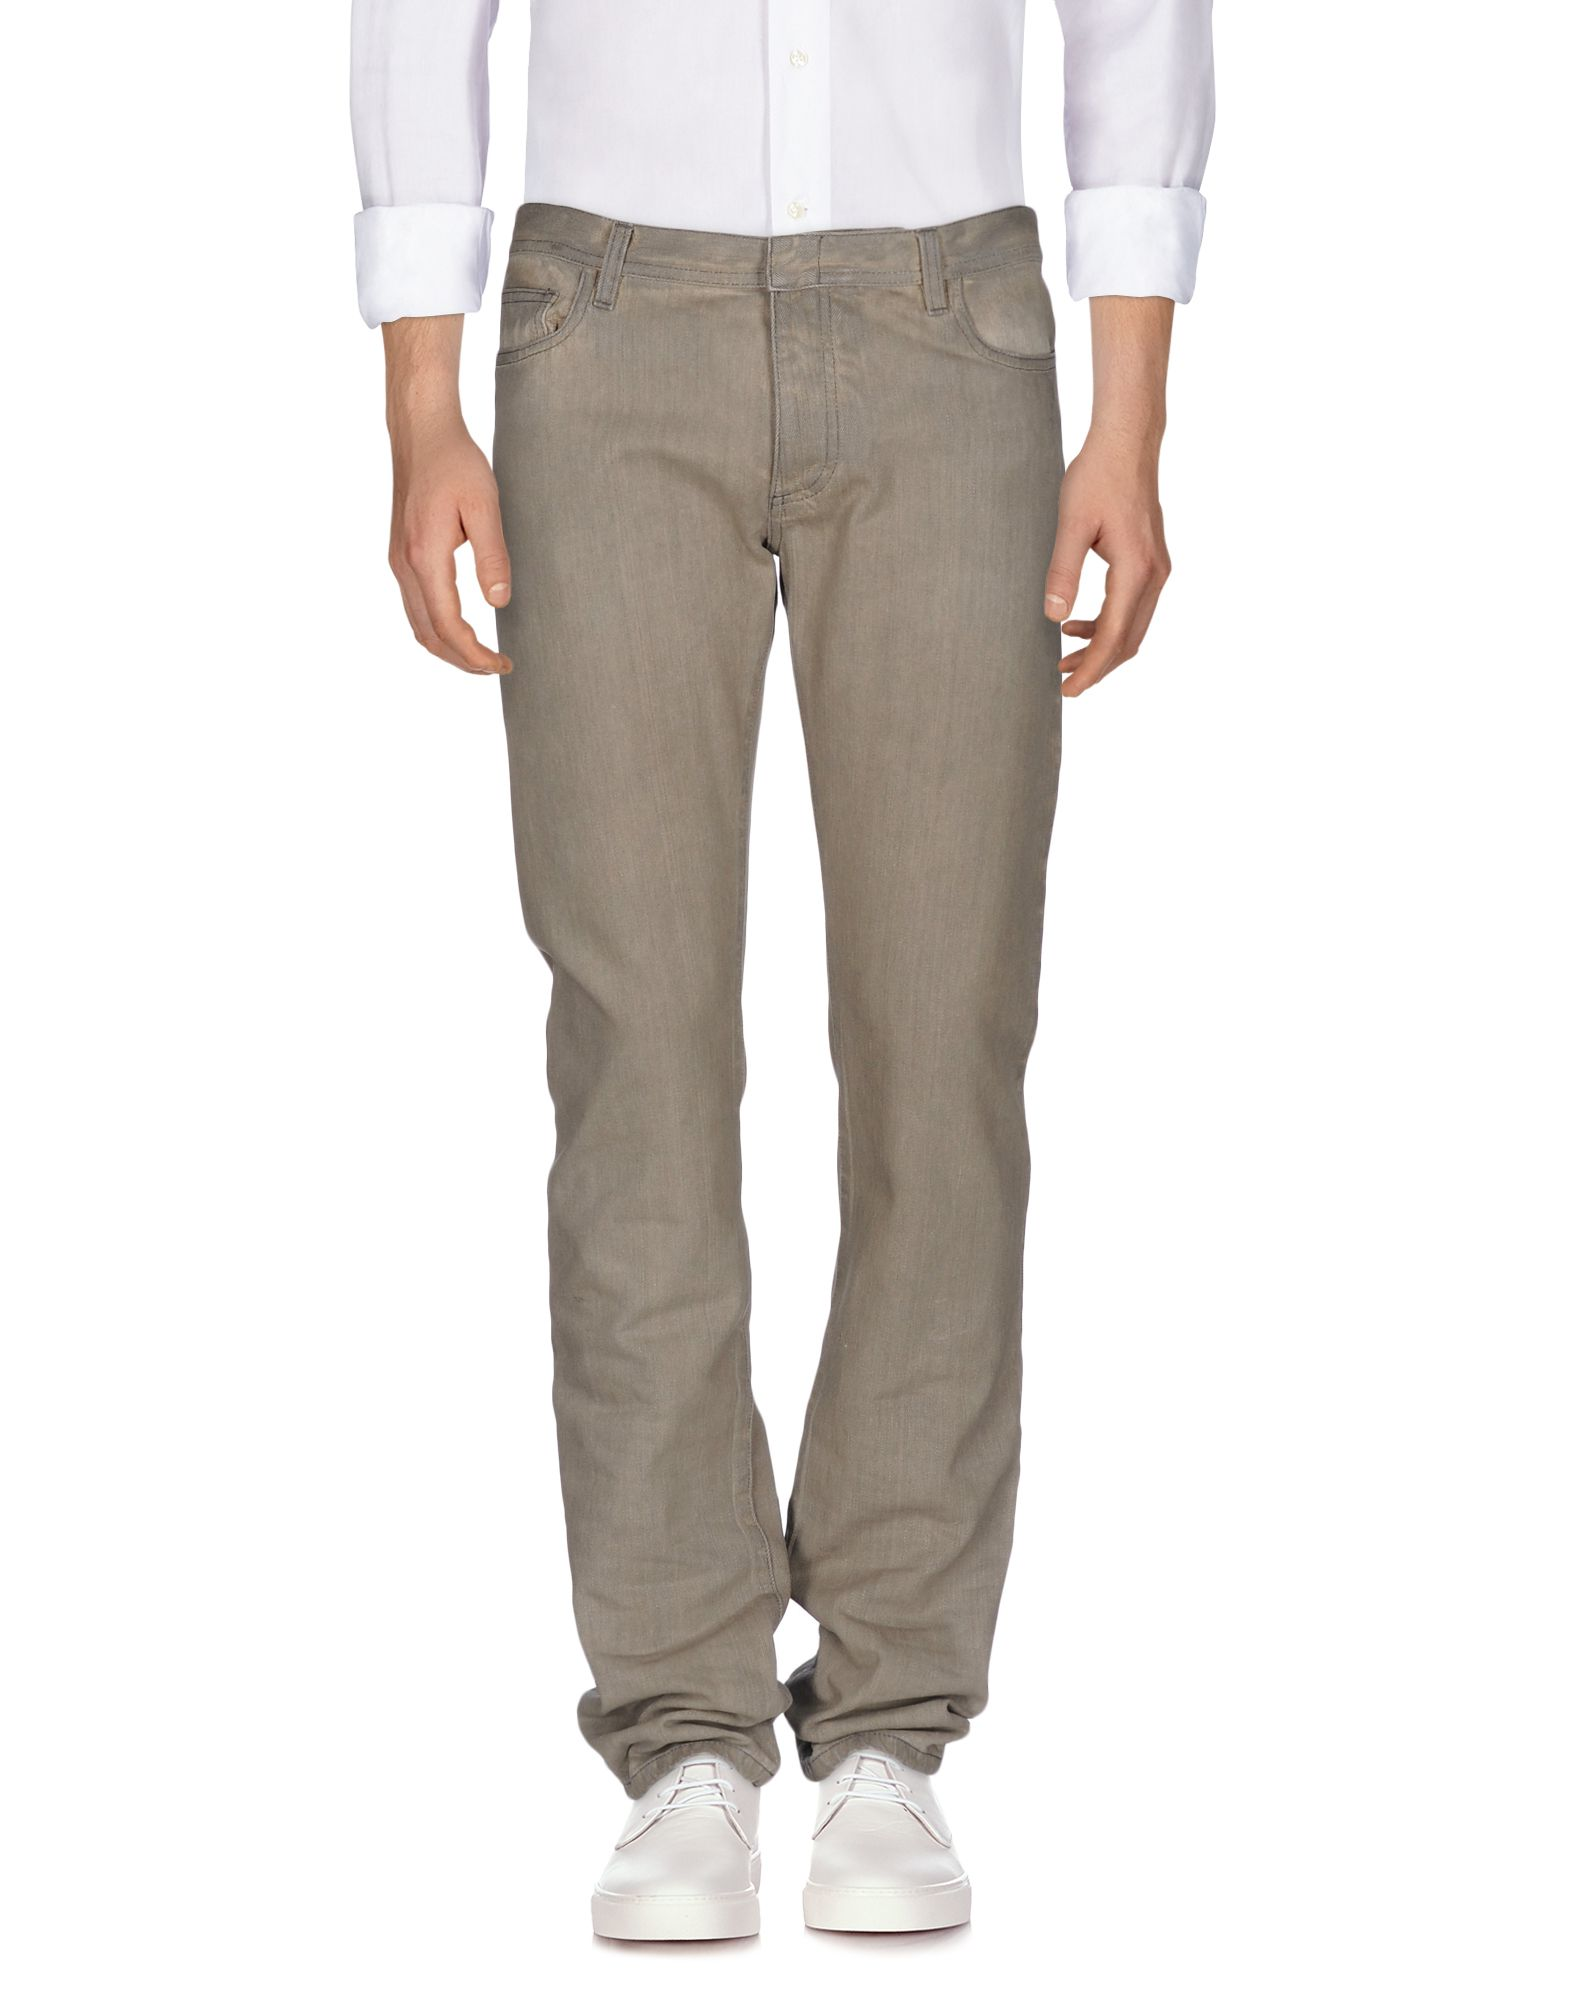 NICOLAS ANDREAS TARALIS Джинсовые брюки цены онлайн